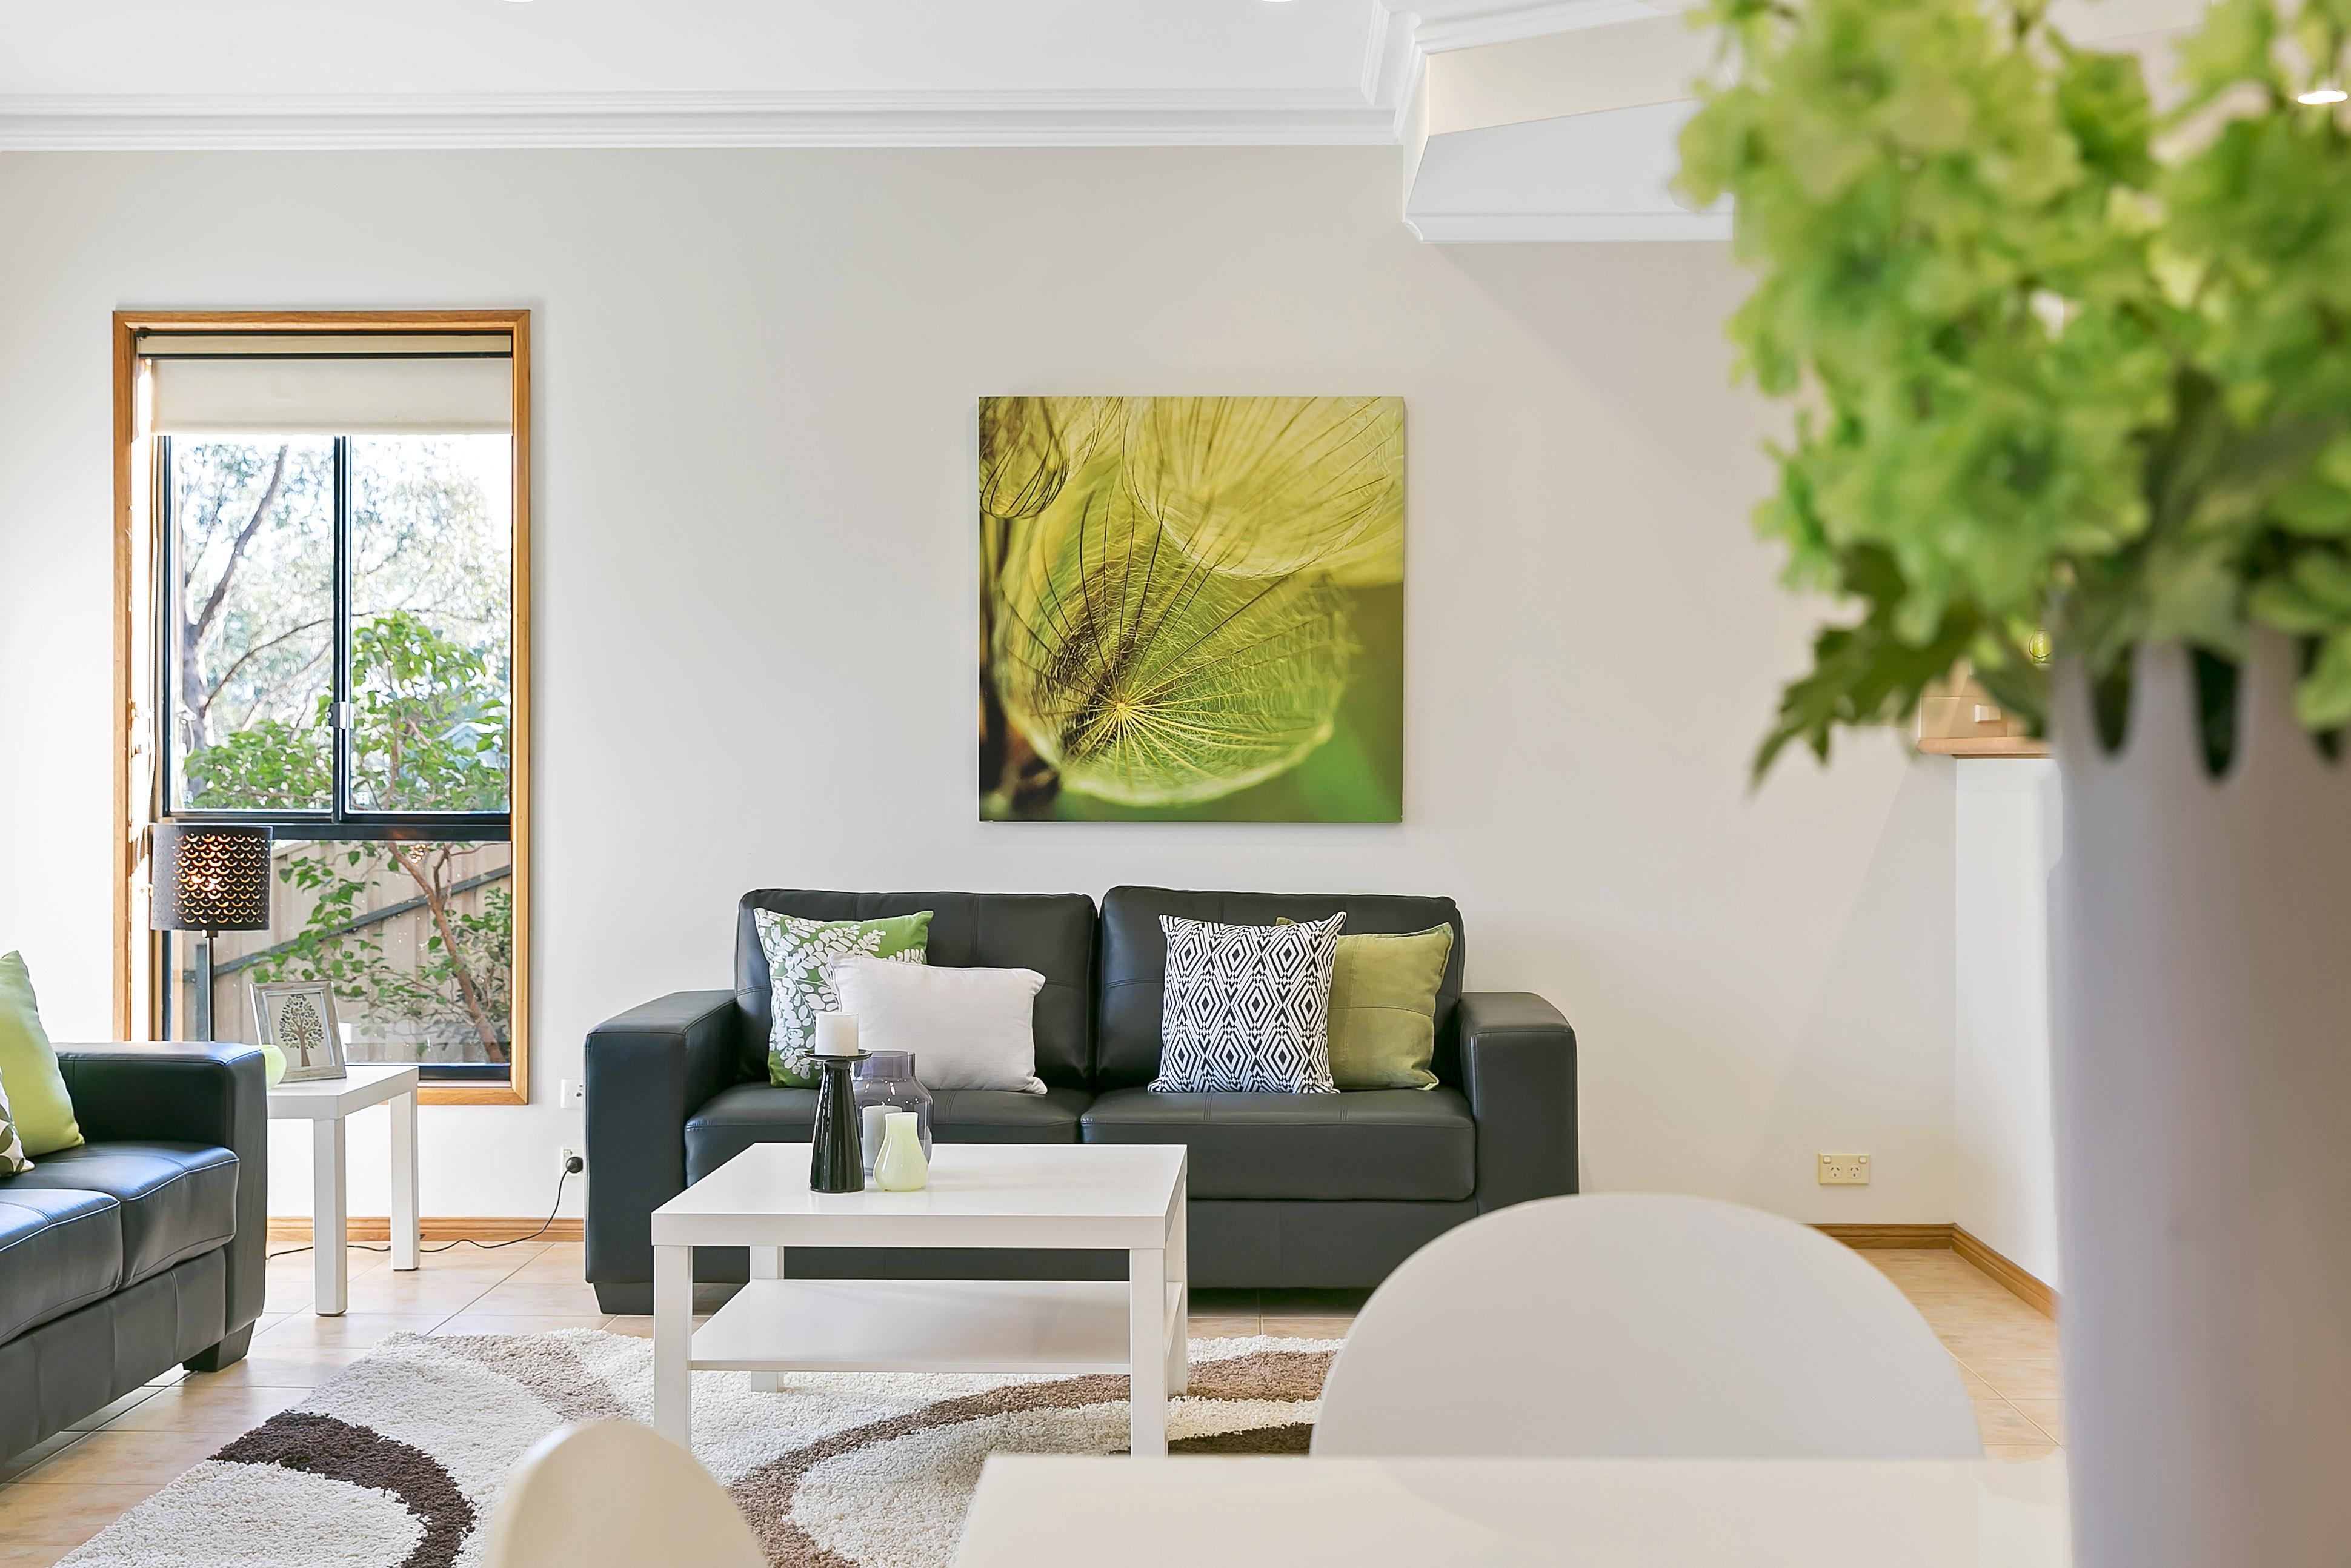 Raine & Horne Blackwood Property Management